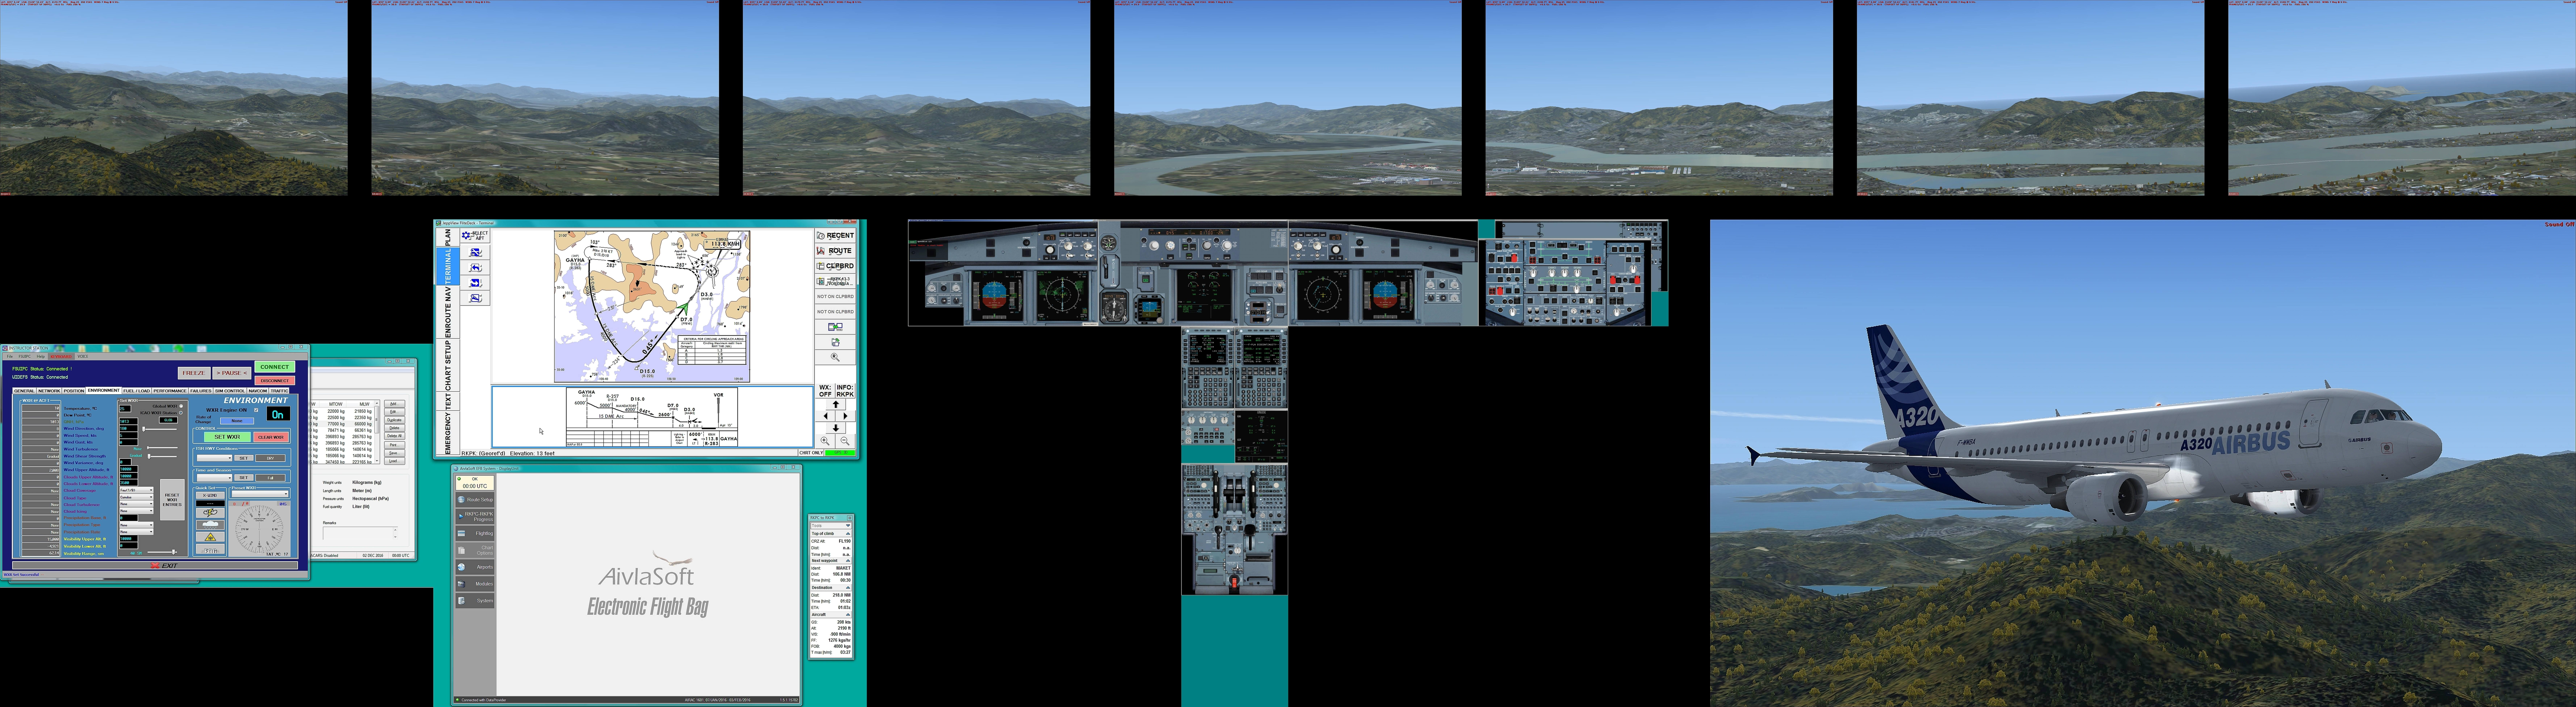 multi-pc cockpit - General Discussion - Flight Sim Labs Forums